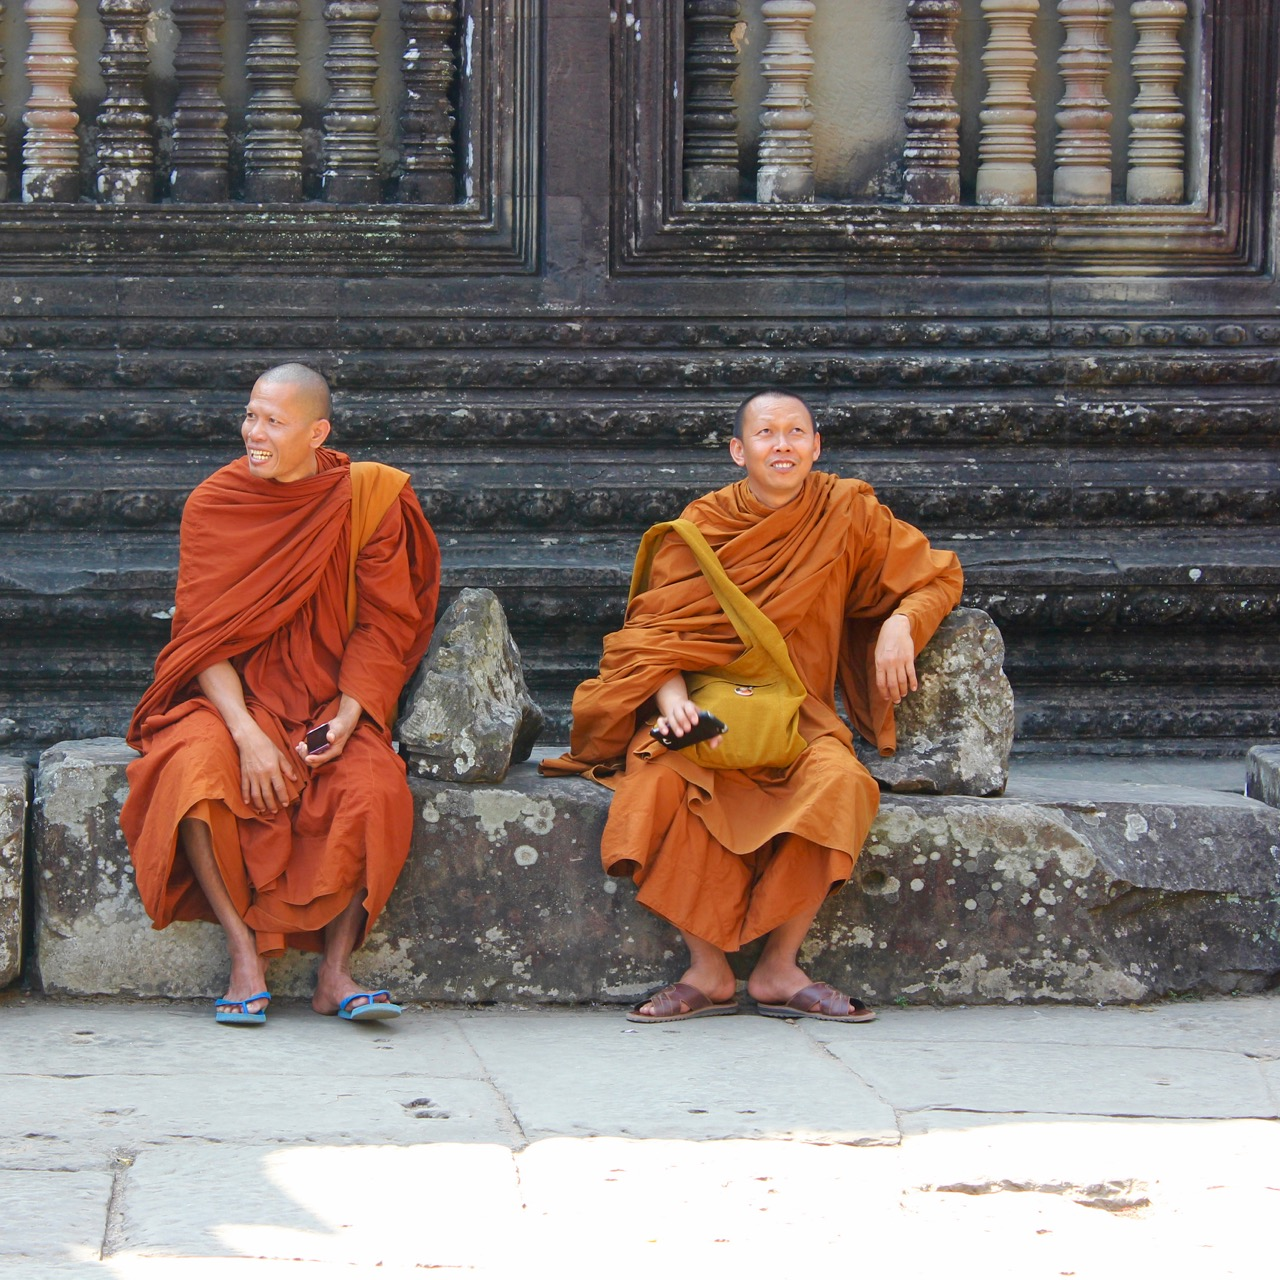 Angkor Wat, Siem Reap, Cambodia - 12